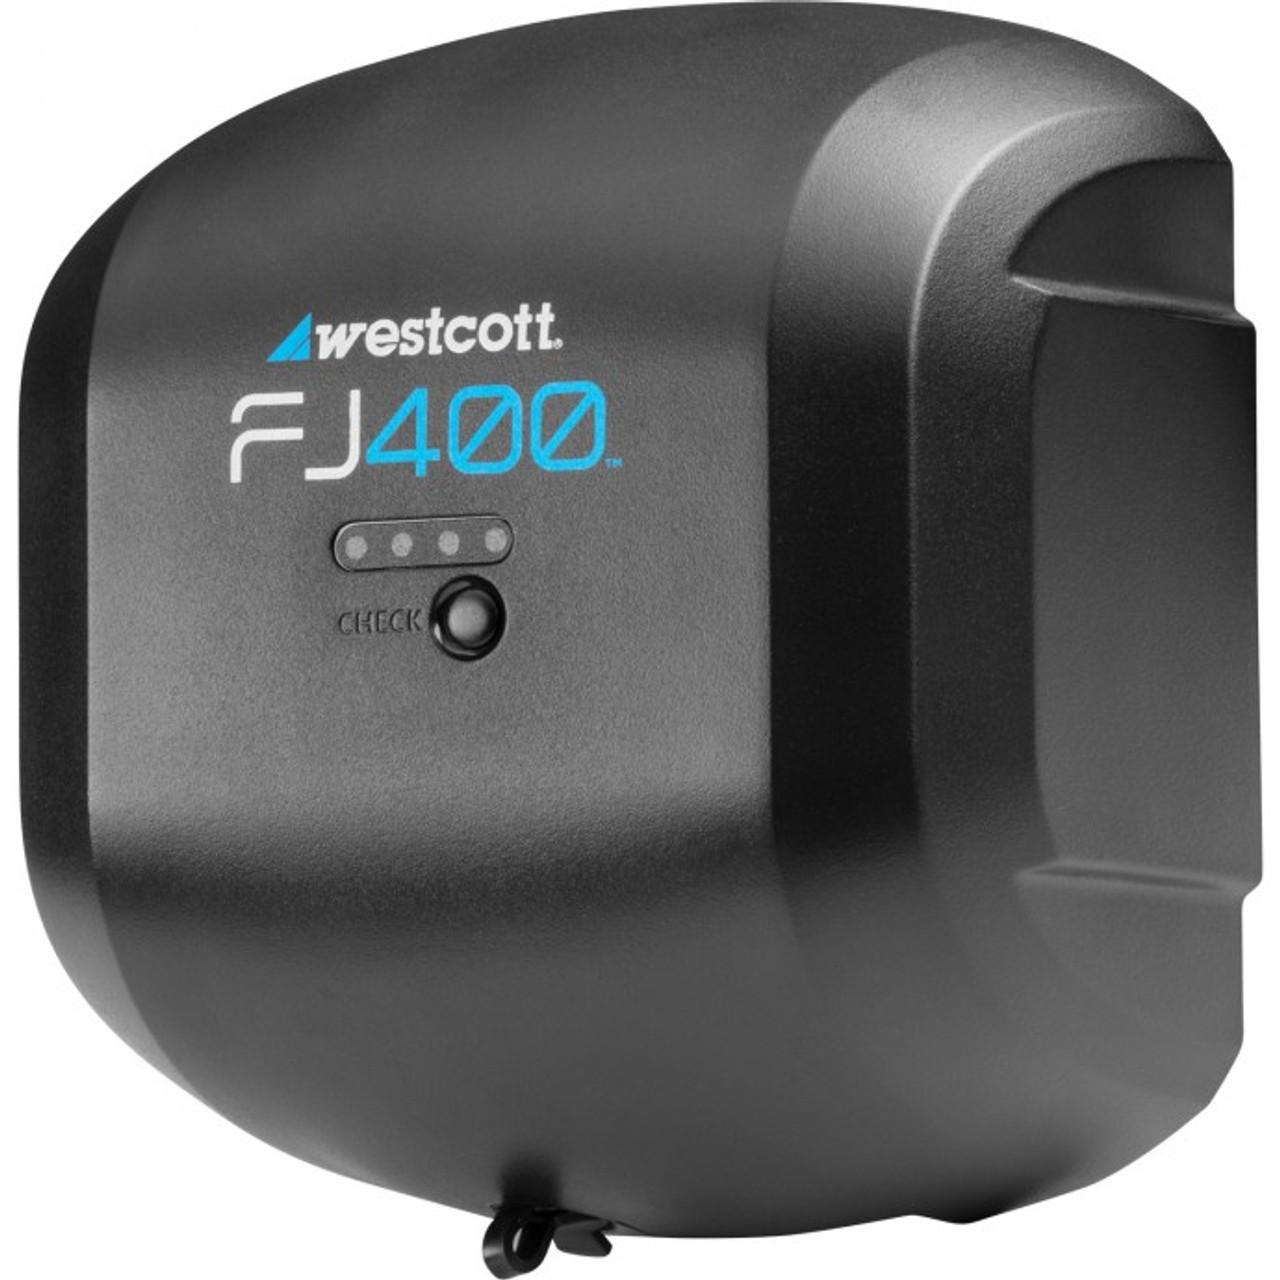 Westcott Lithium-Ion Polymer Battery for FJ400 AC/DC Strobe